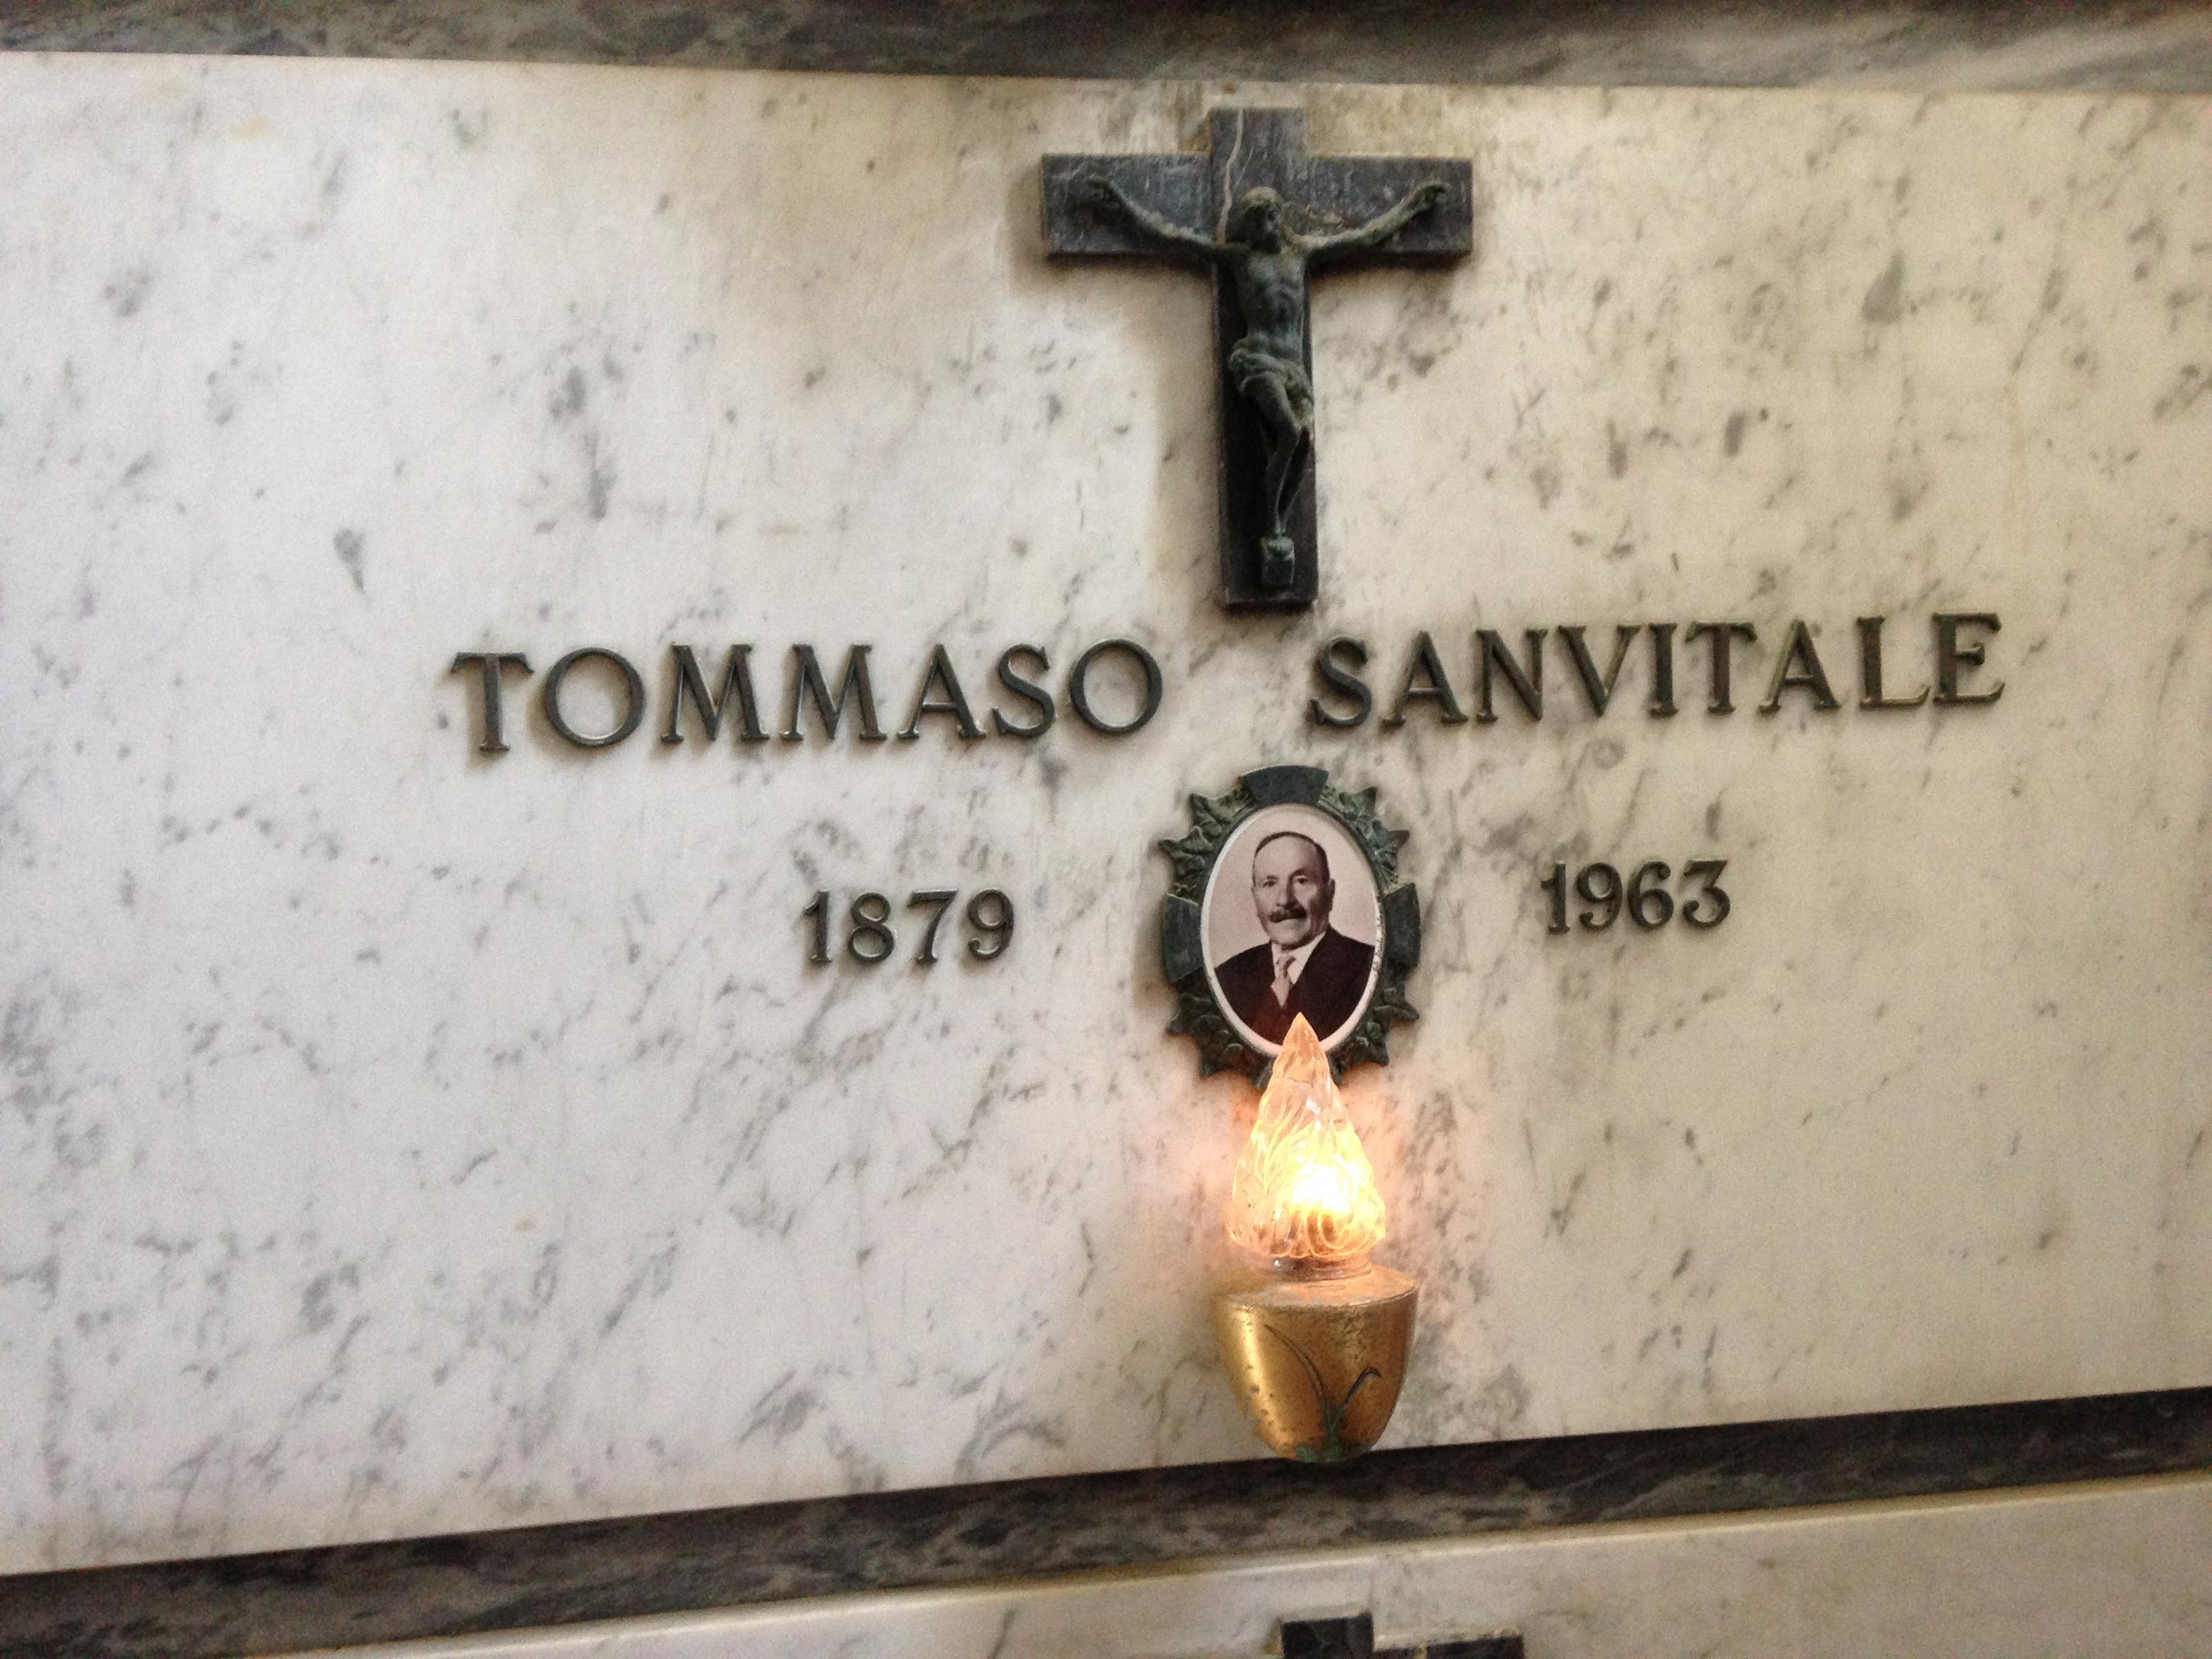 Stefano Sanvitale